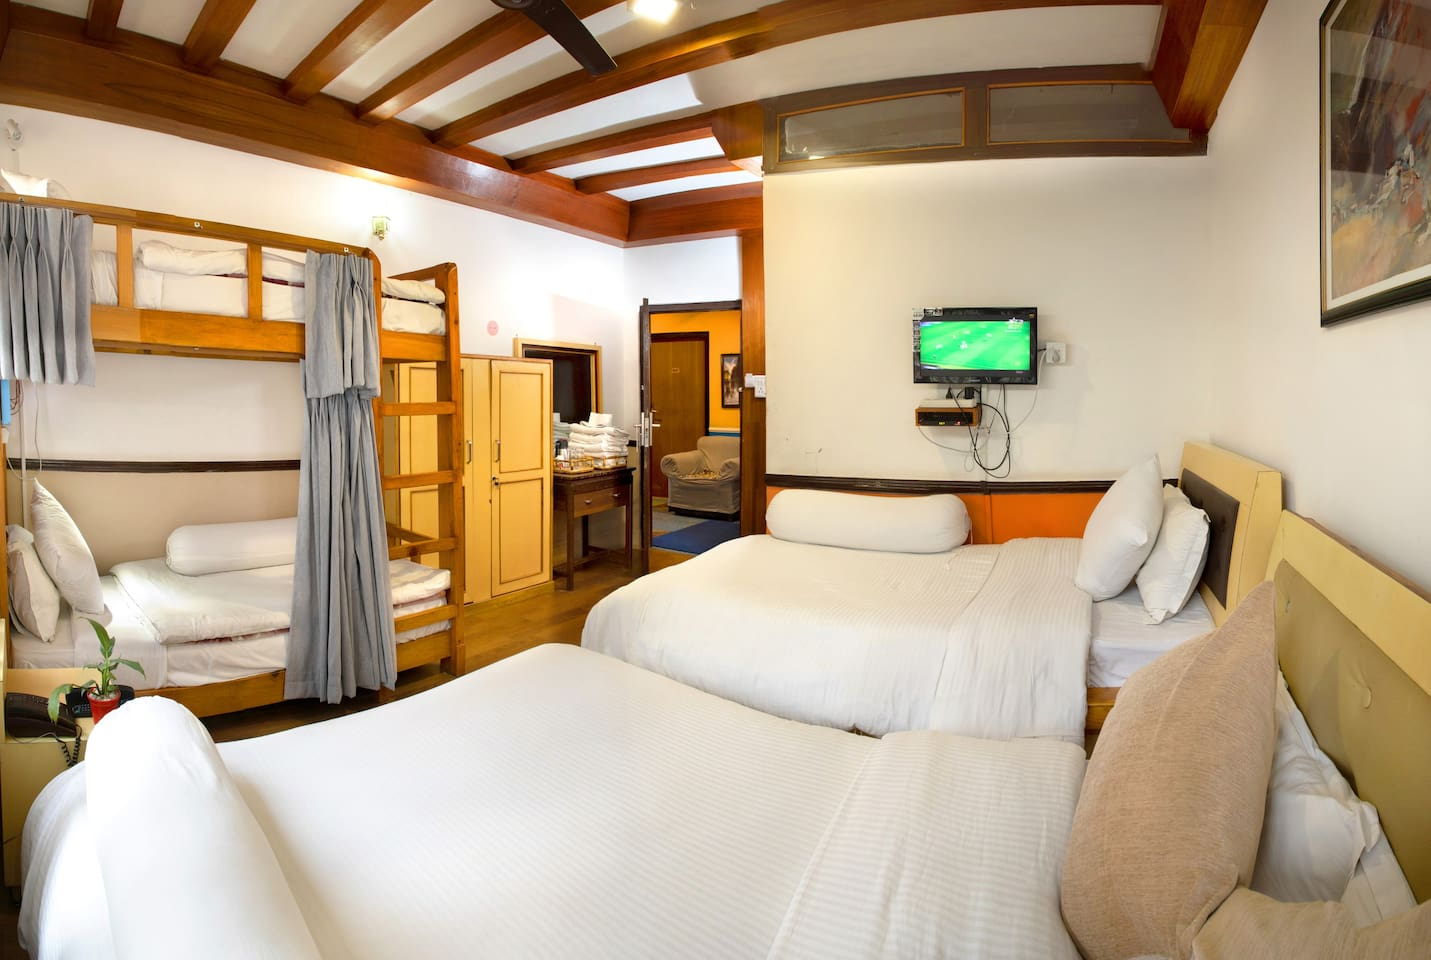 Your bedroom view